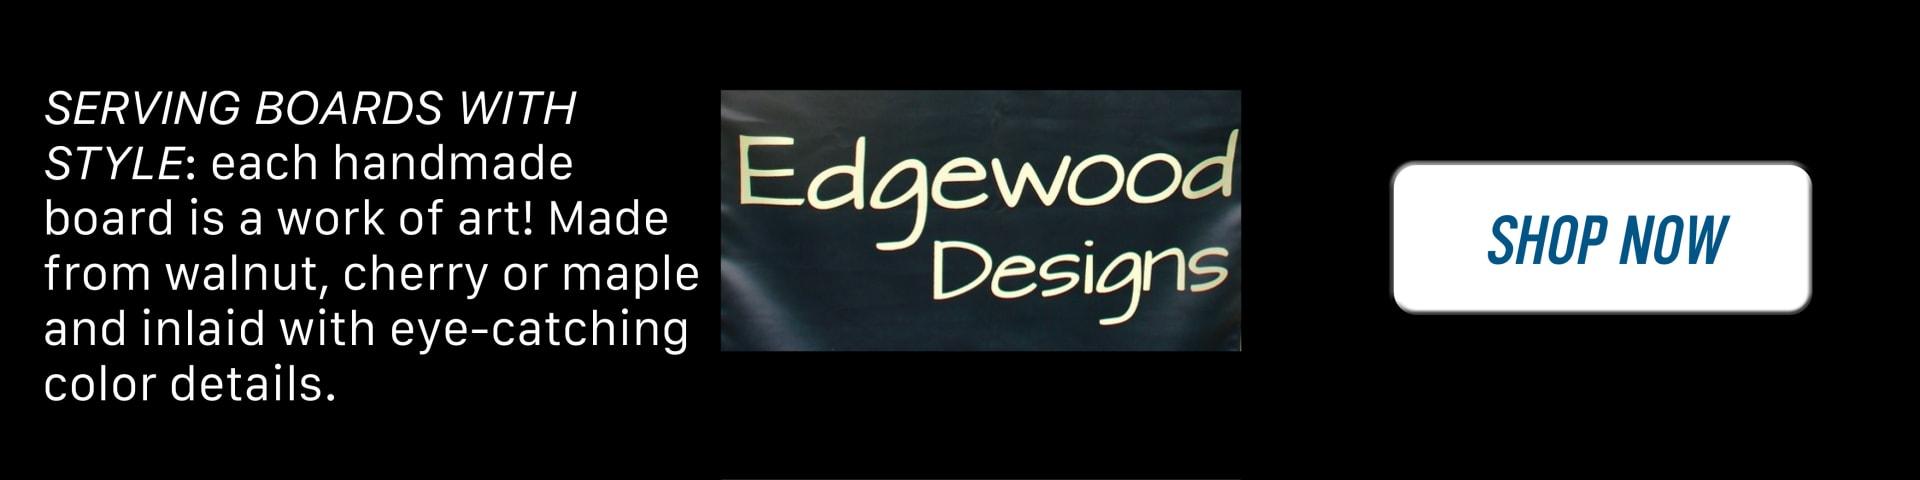 EdgewoodBanner-w1920.jpg